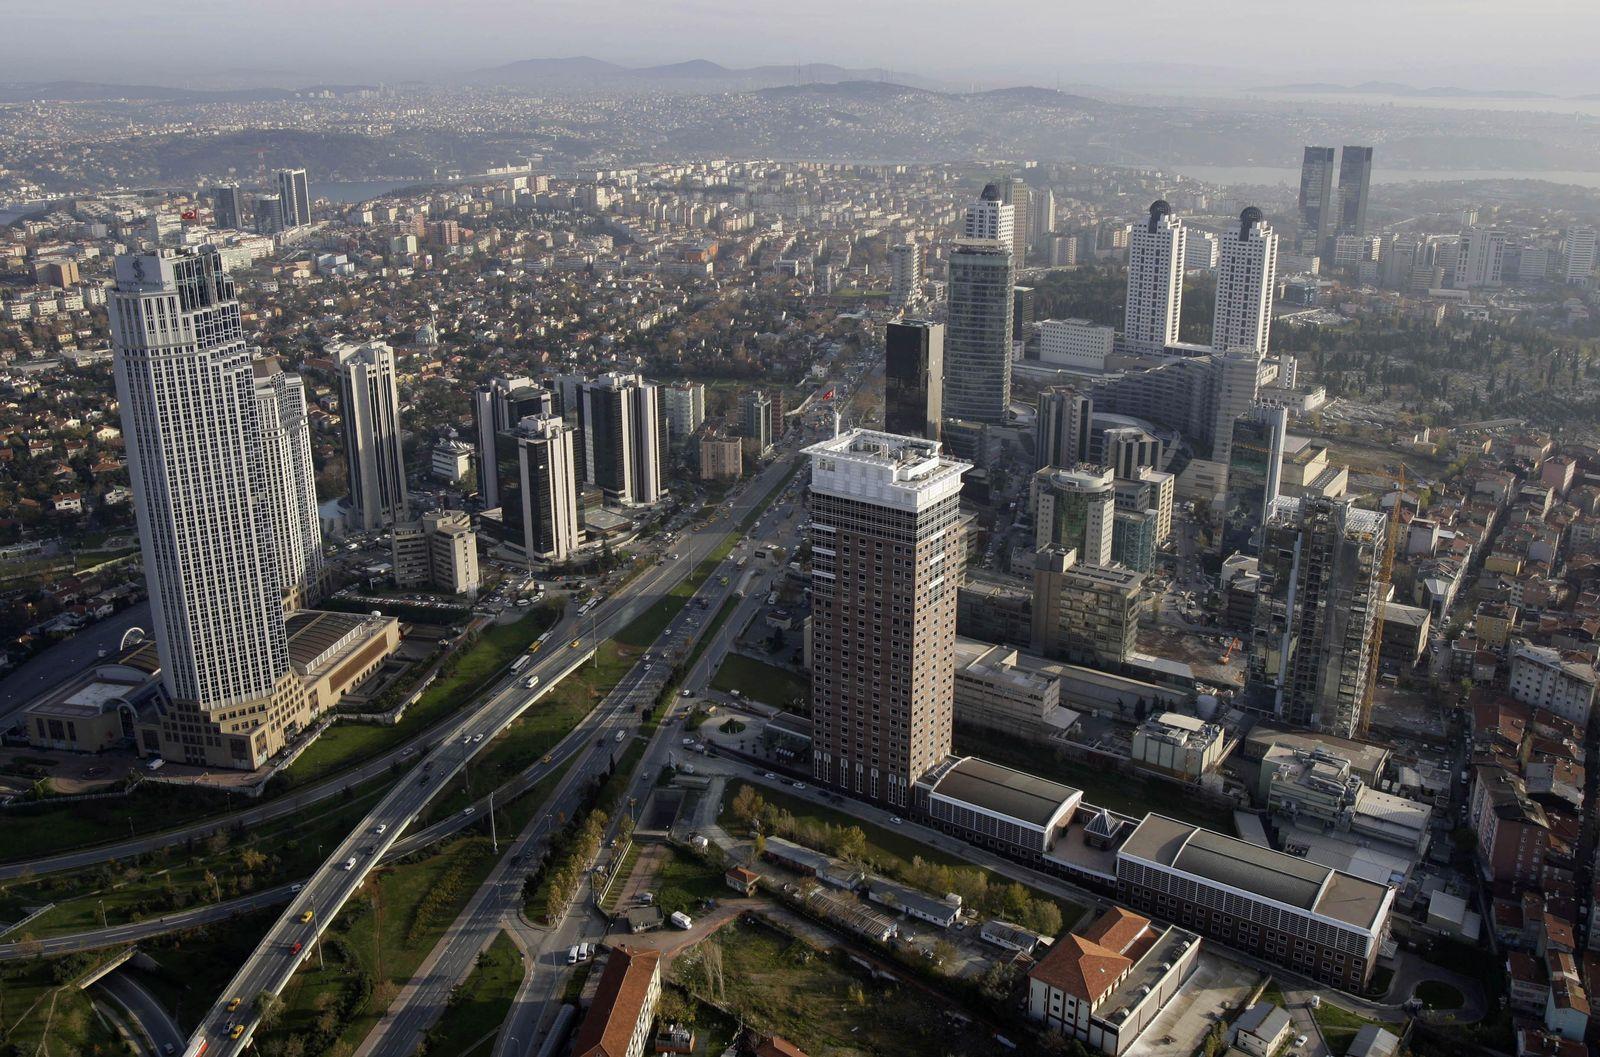 Turkey Istanbul Levent